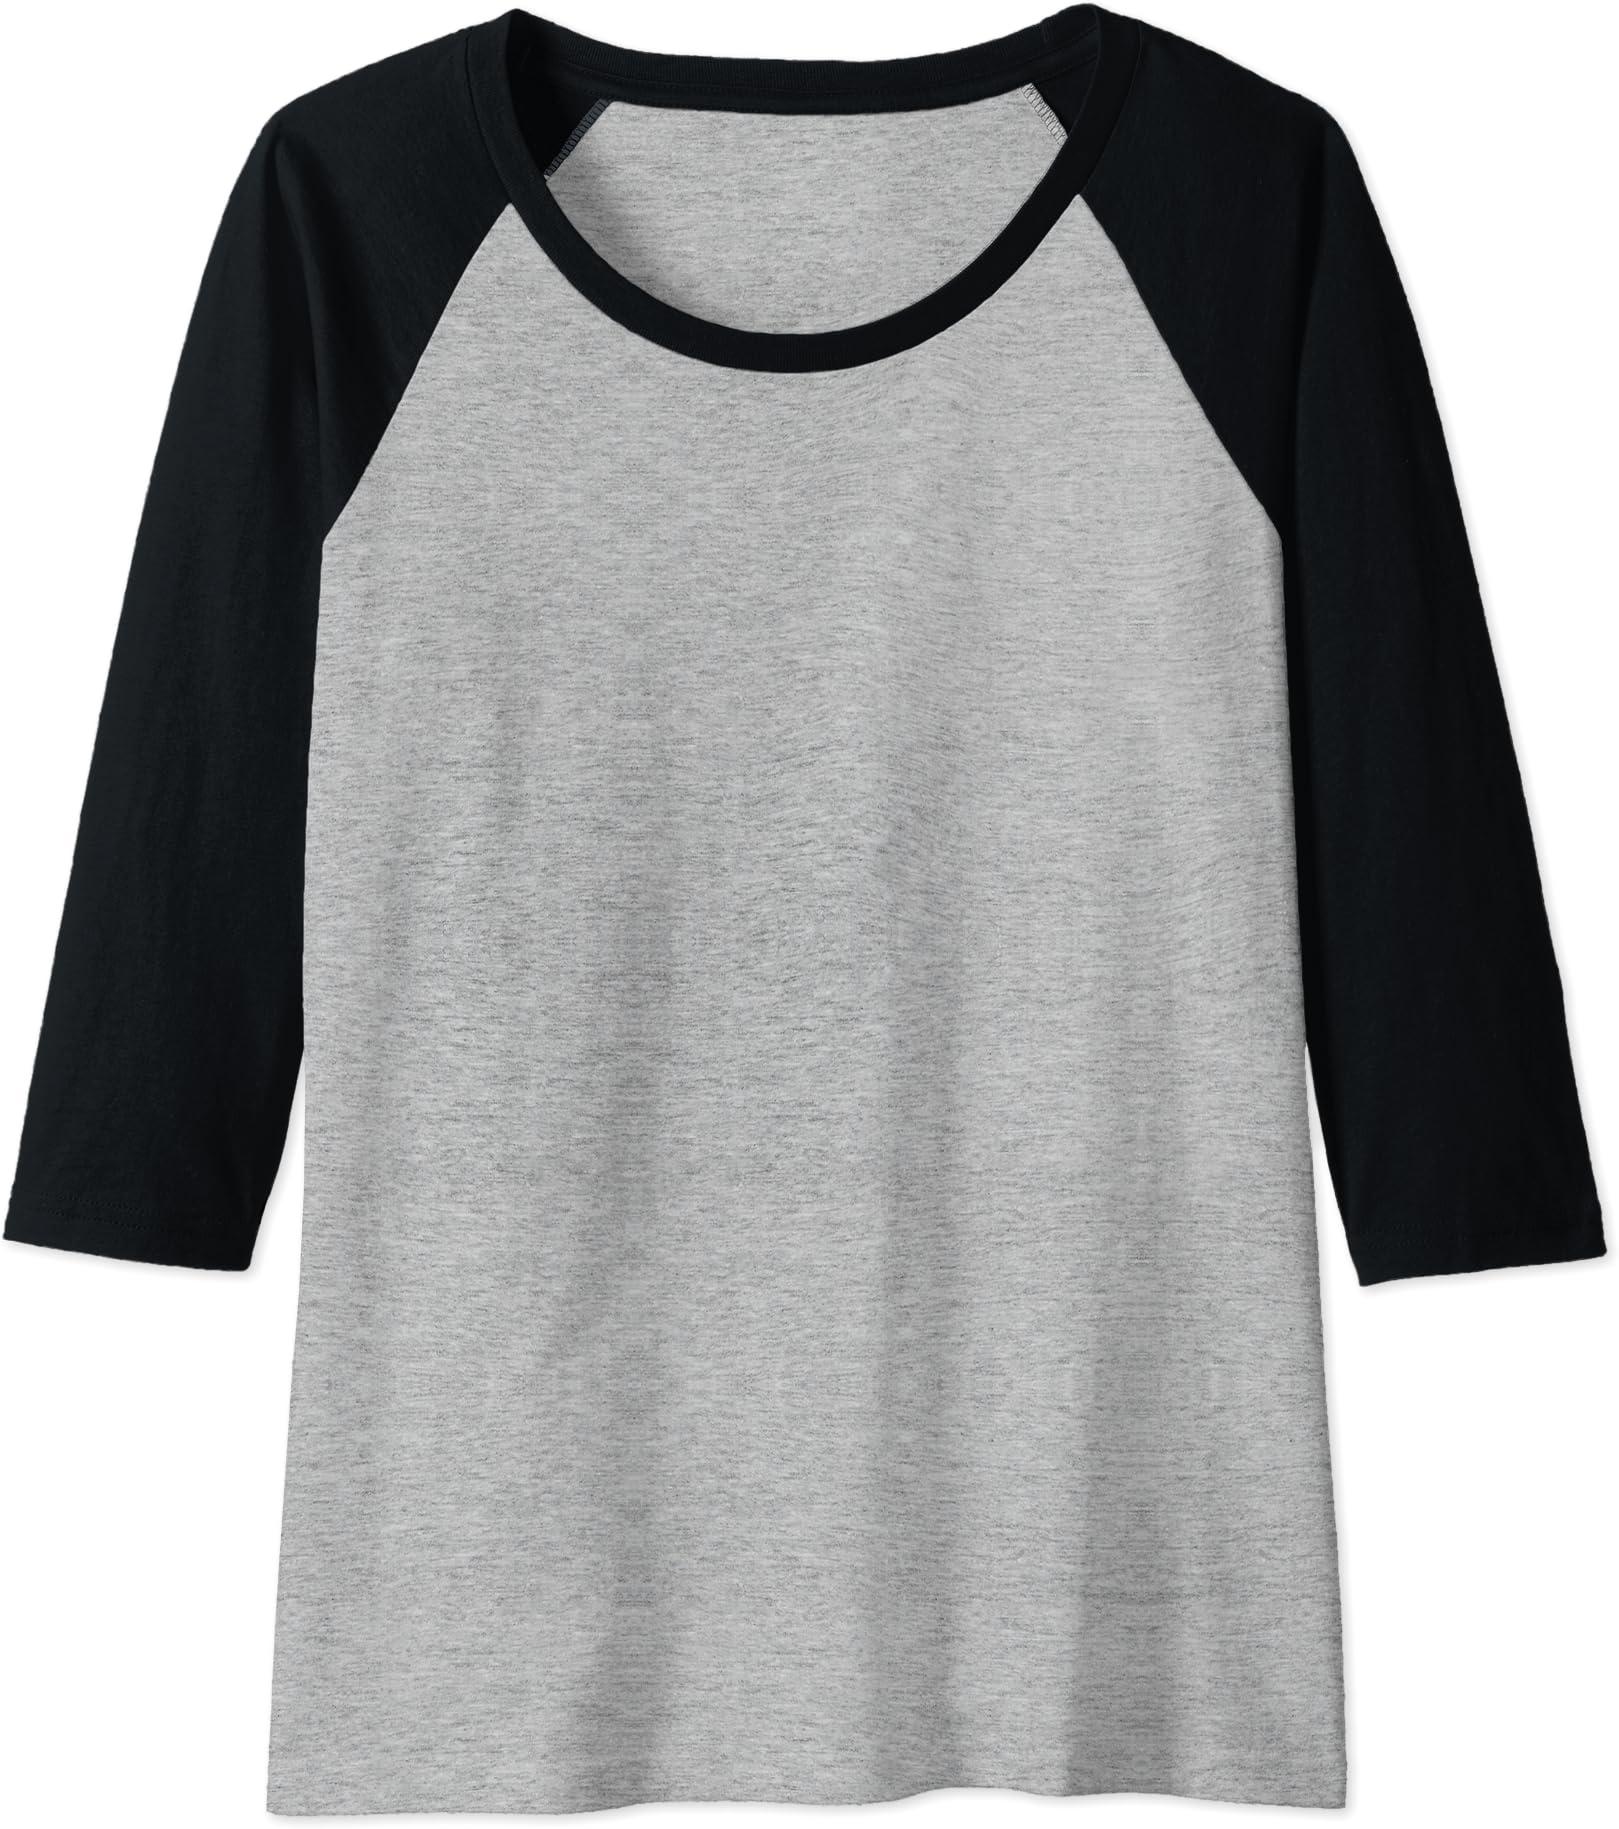 NCAA Christopher Newport Captains PPCNU01 Toddler Long-Sleeve T-Shirt